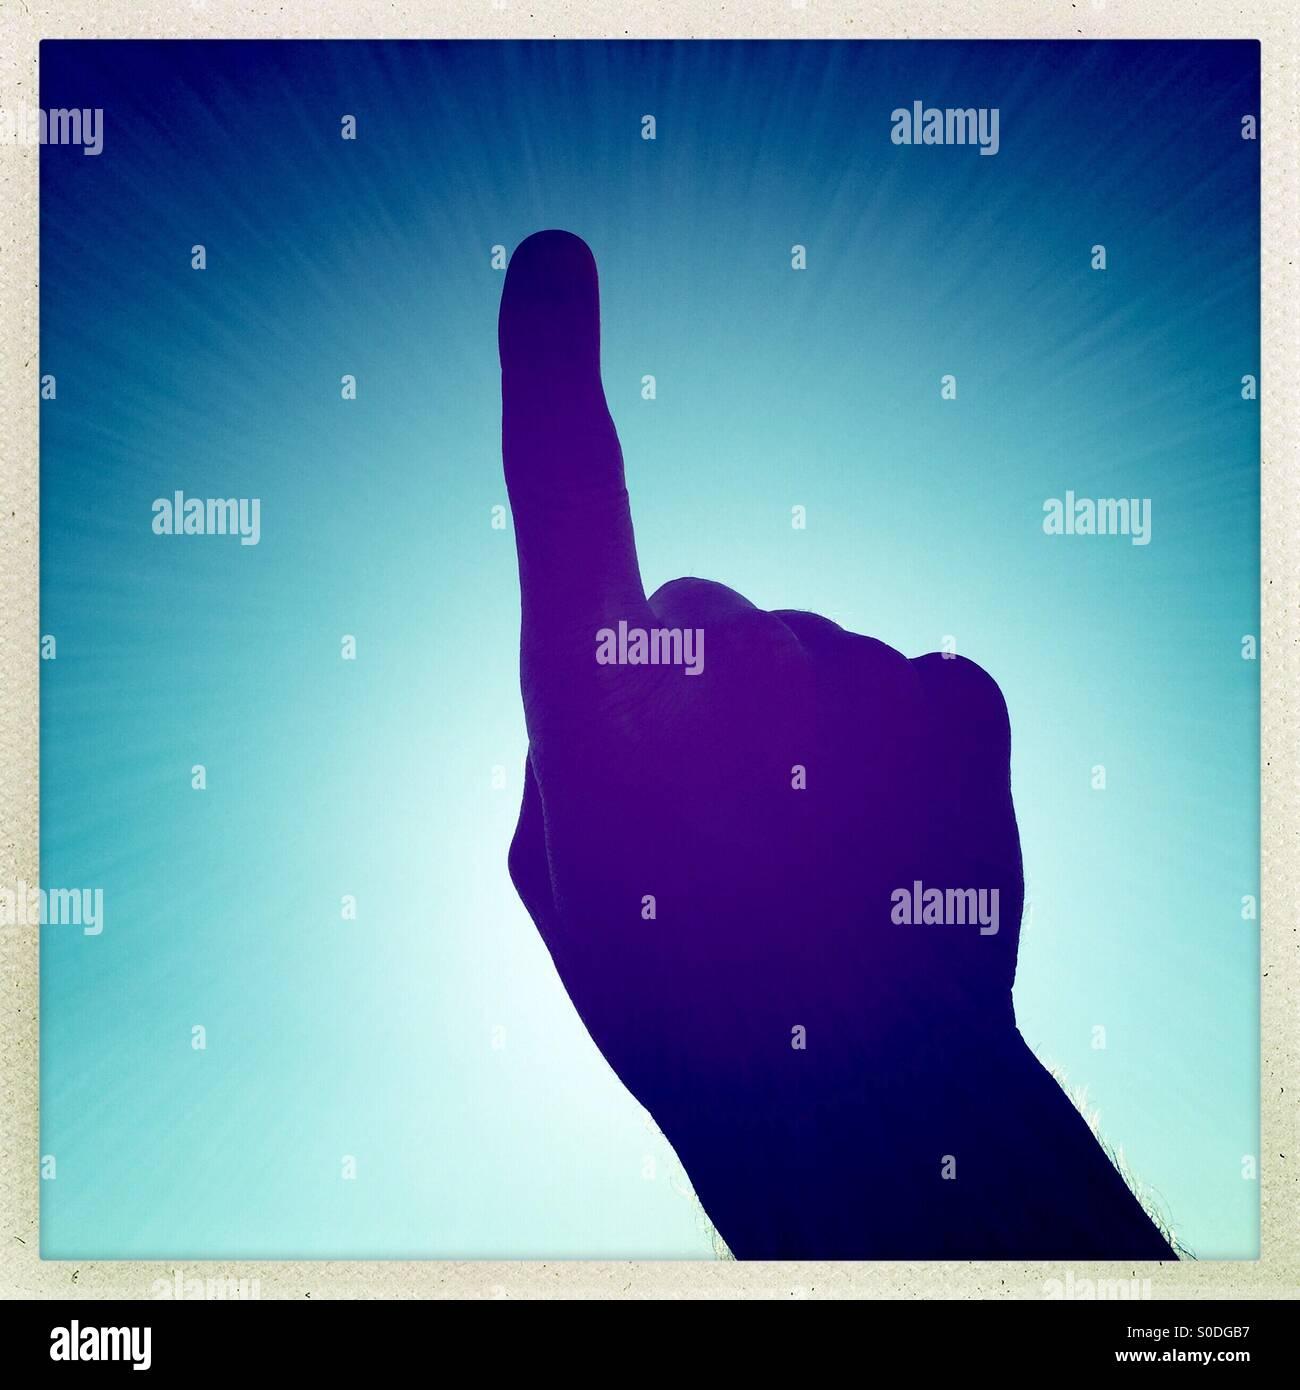 Einen Finger gegen blauen Himmel Stockbild